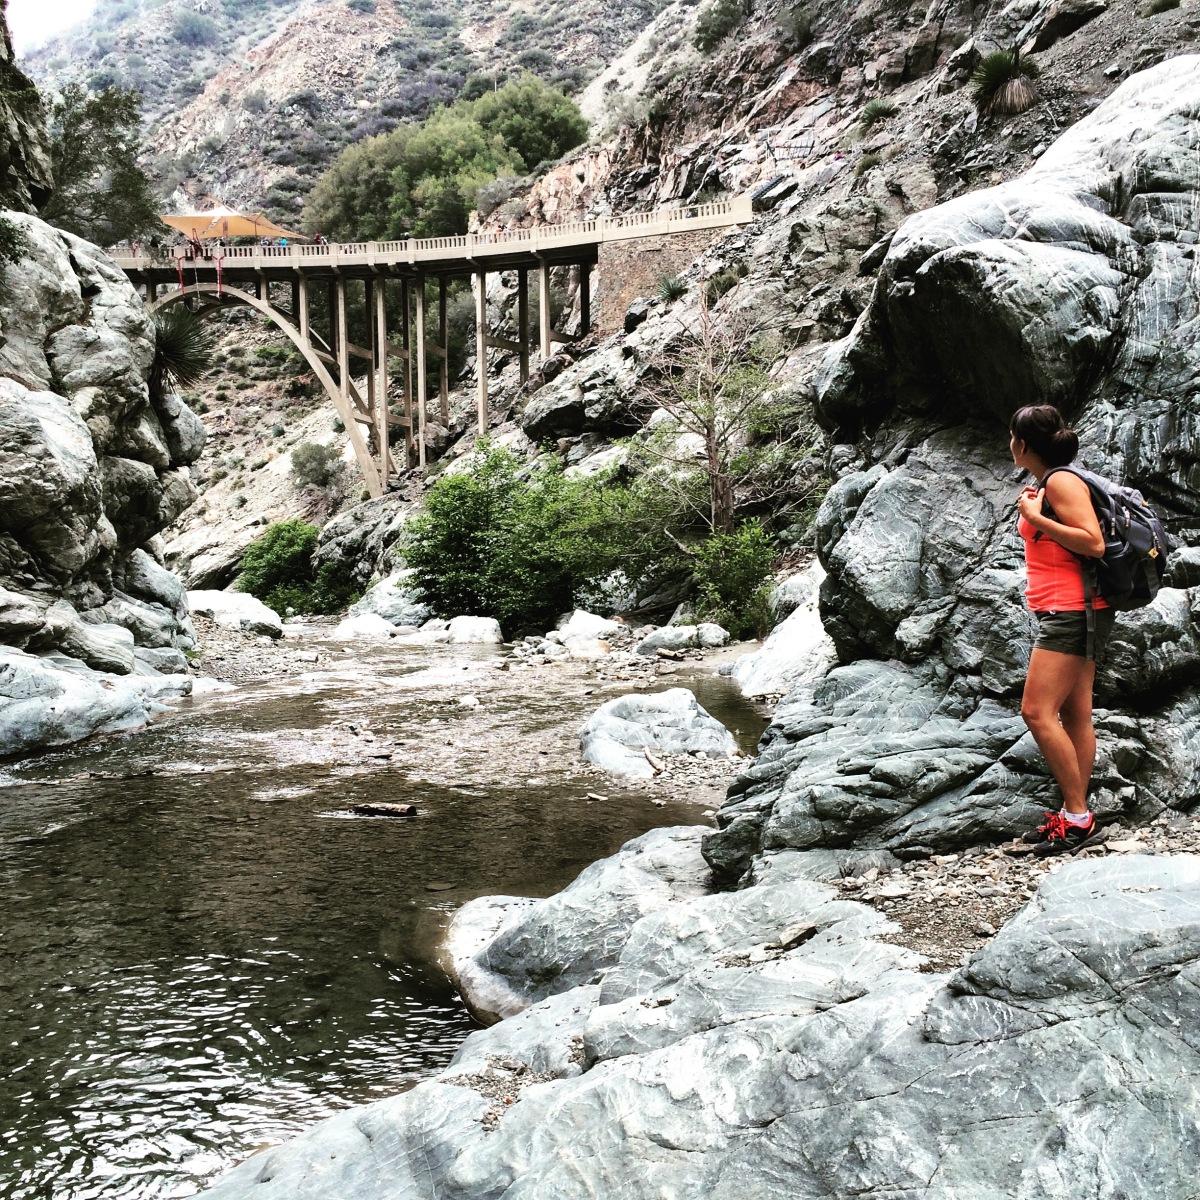 Bridge to Nowhere Hike – Monica Goes